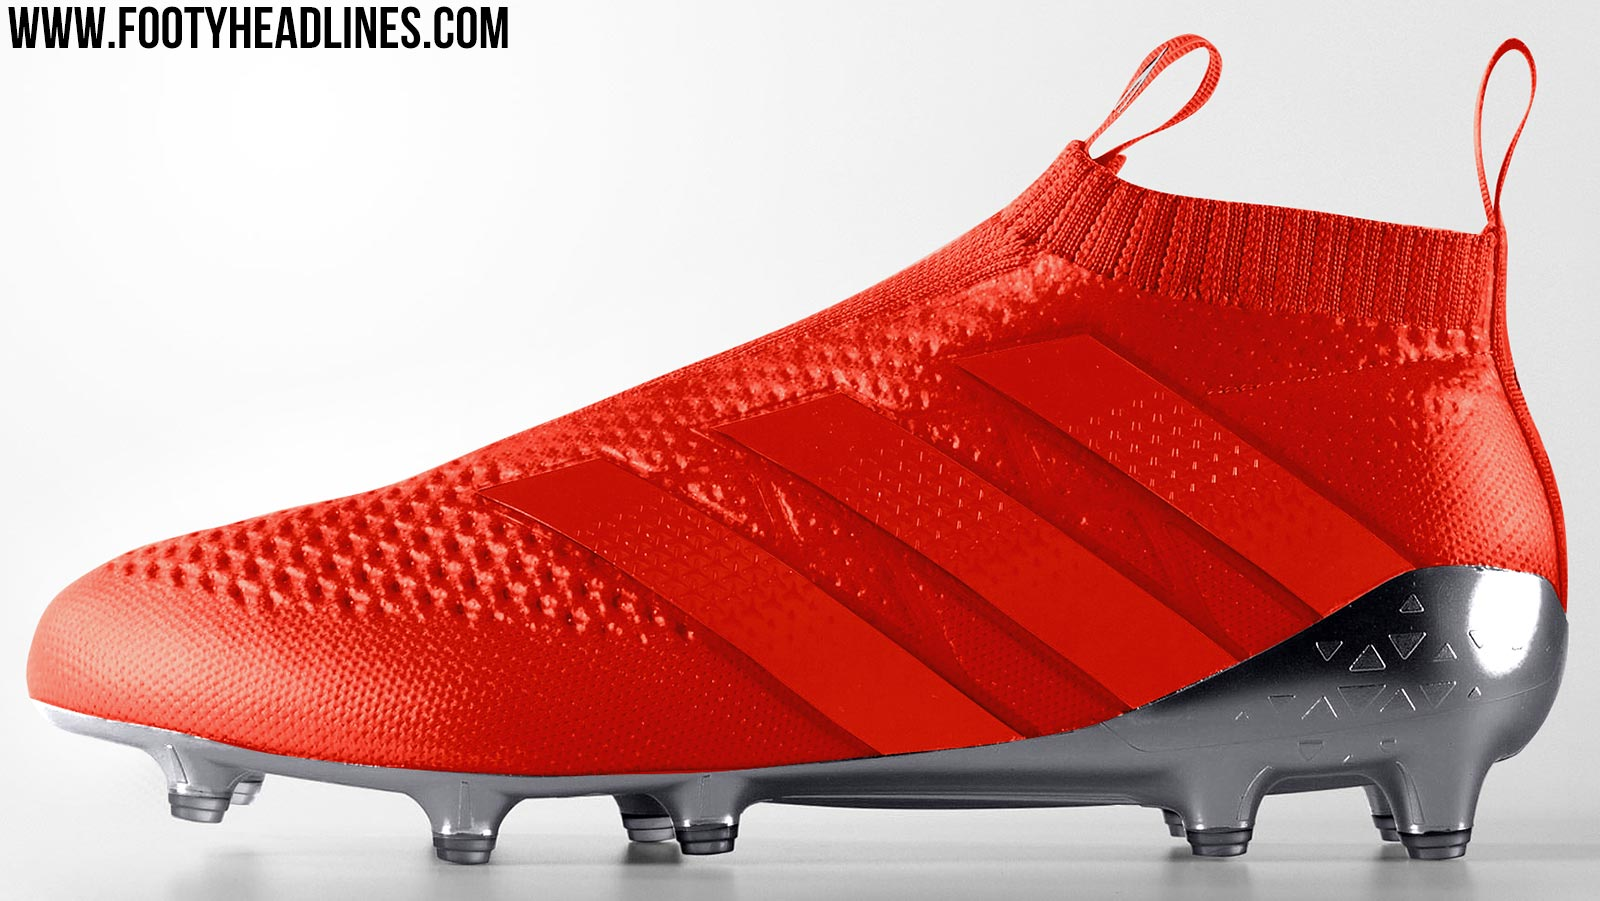 low priced 07aa3 270f6 adidas ace 16 purecontrol purple